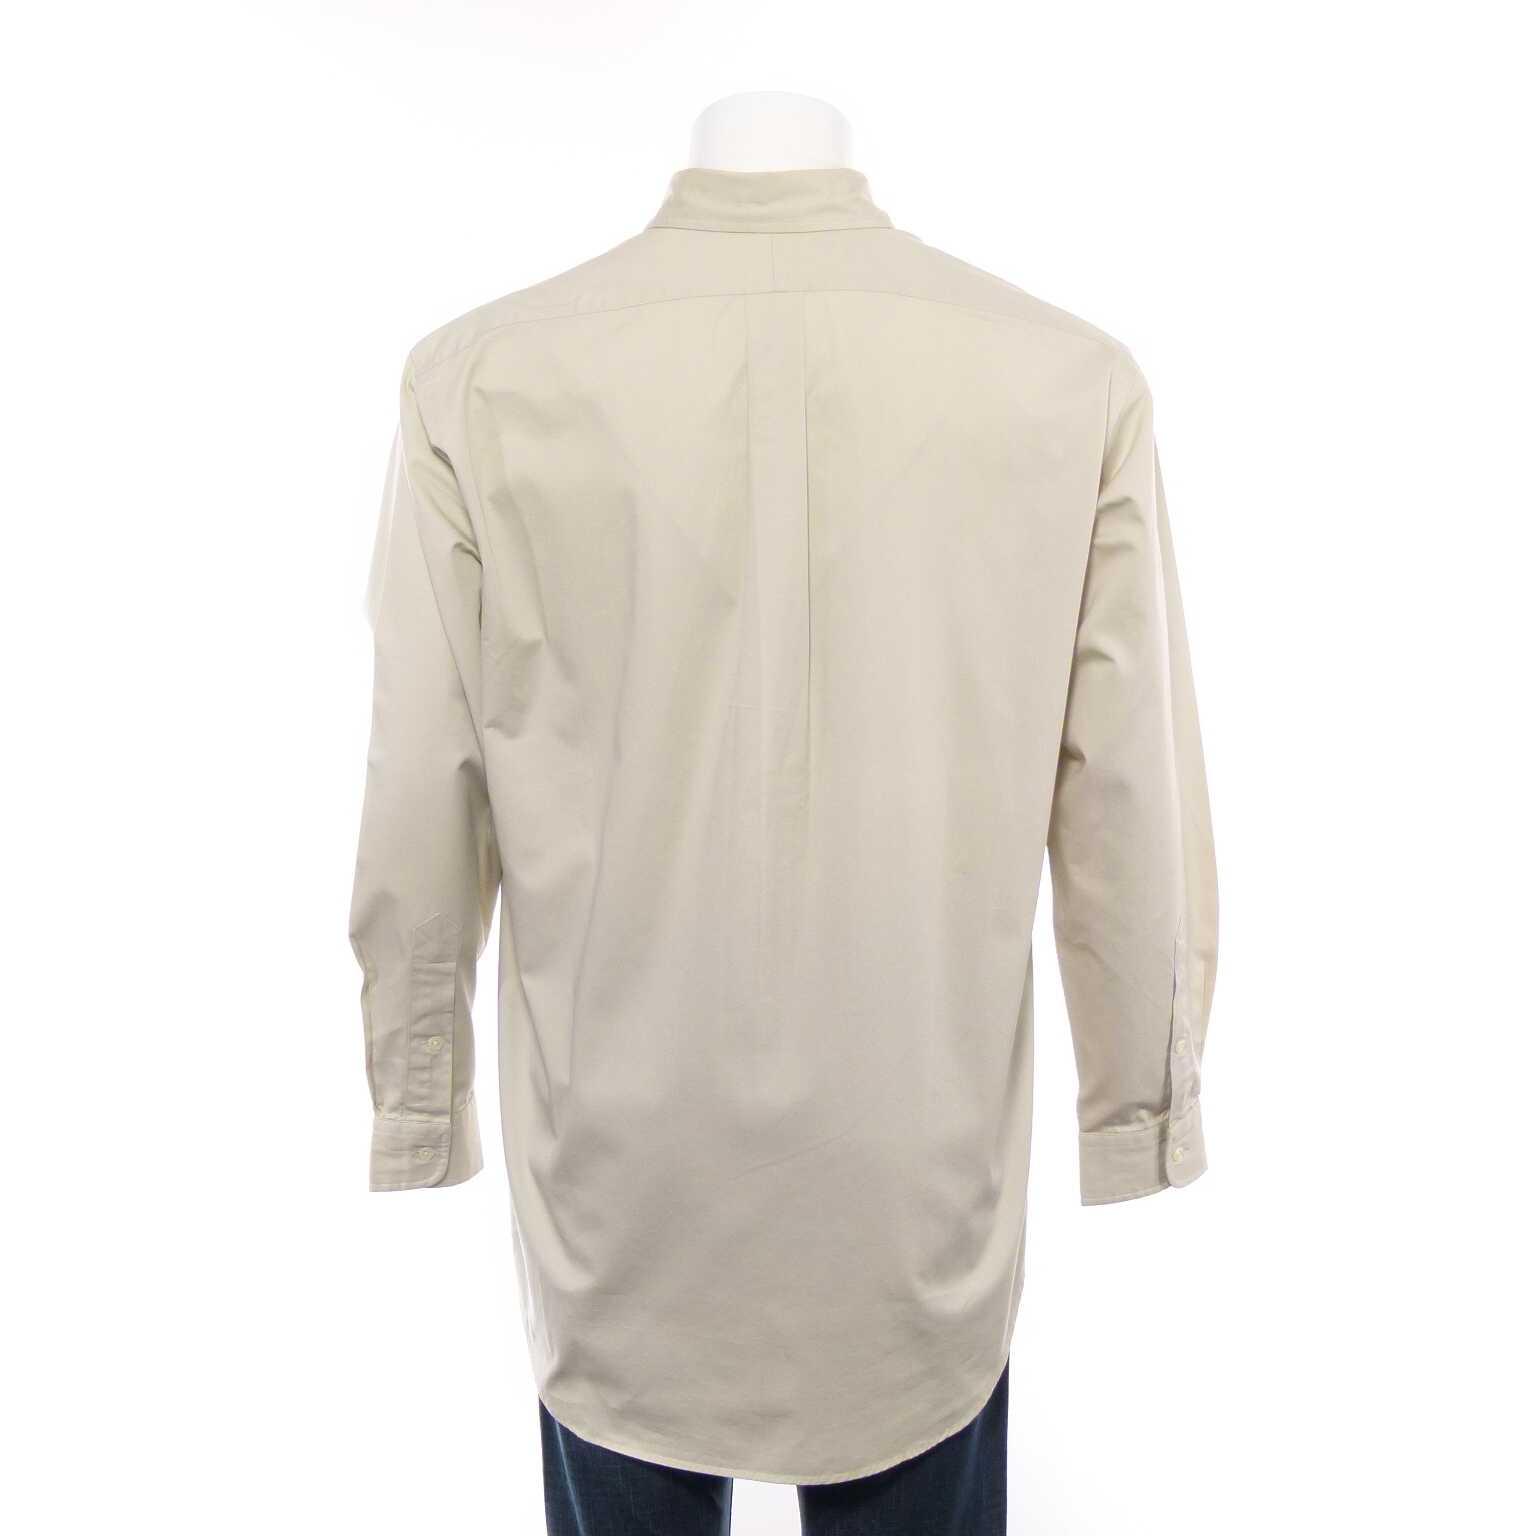 polo ralph lauren blake hemd gr m in beige ivory gestreift ahb men hemden. Black Bedroom Furniture Sets. Home Design Ideas